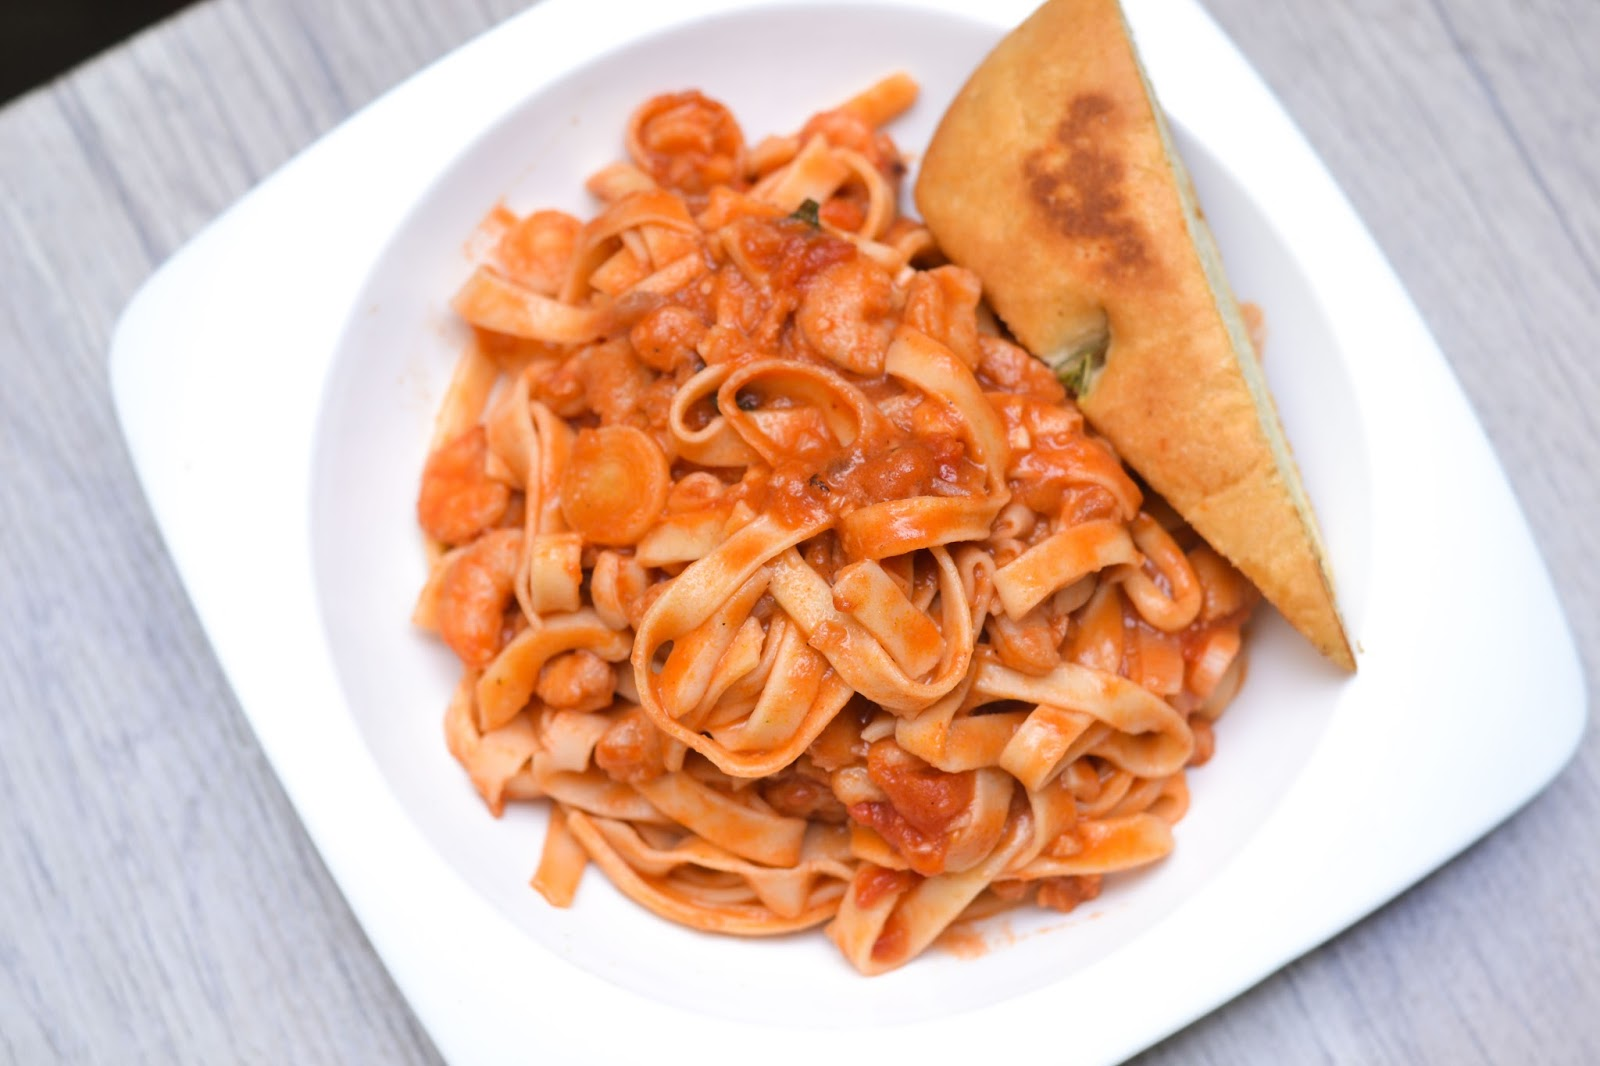 Pasta & Tomato Sauce in Lagos